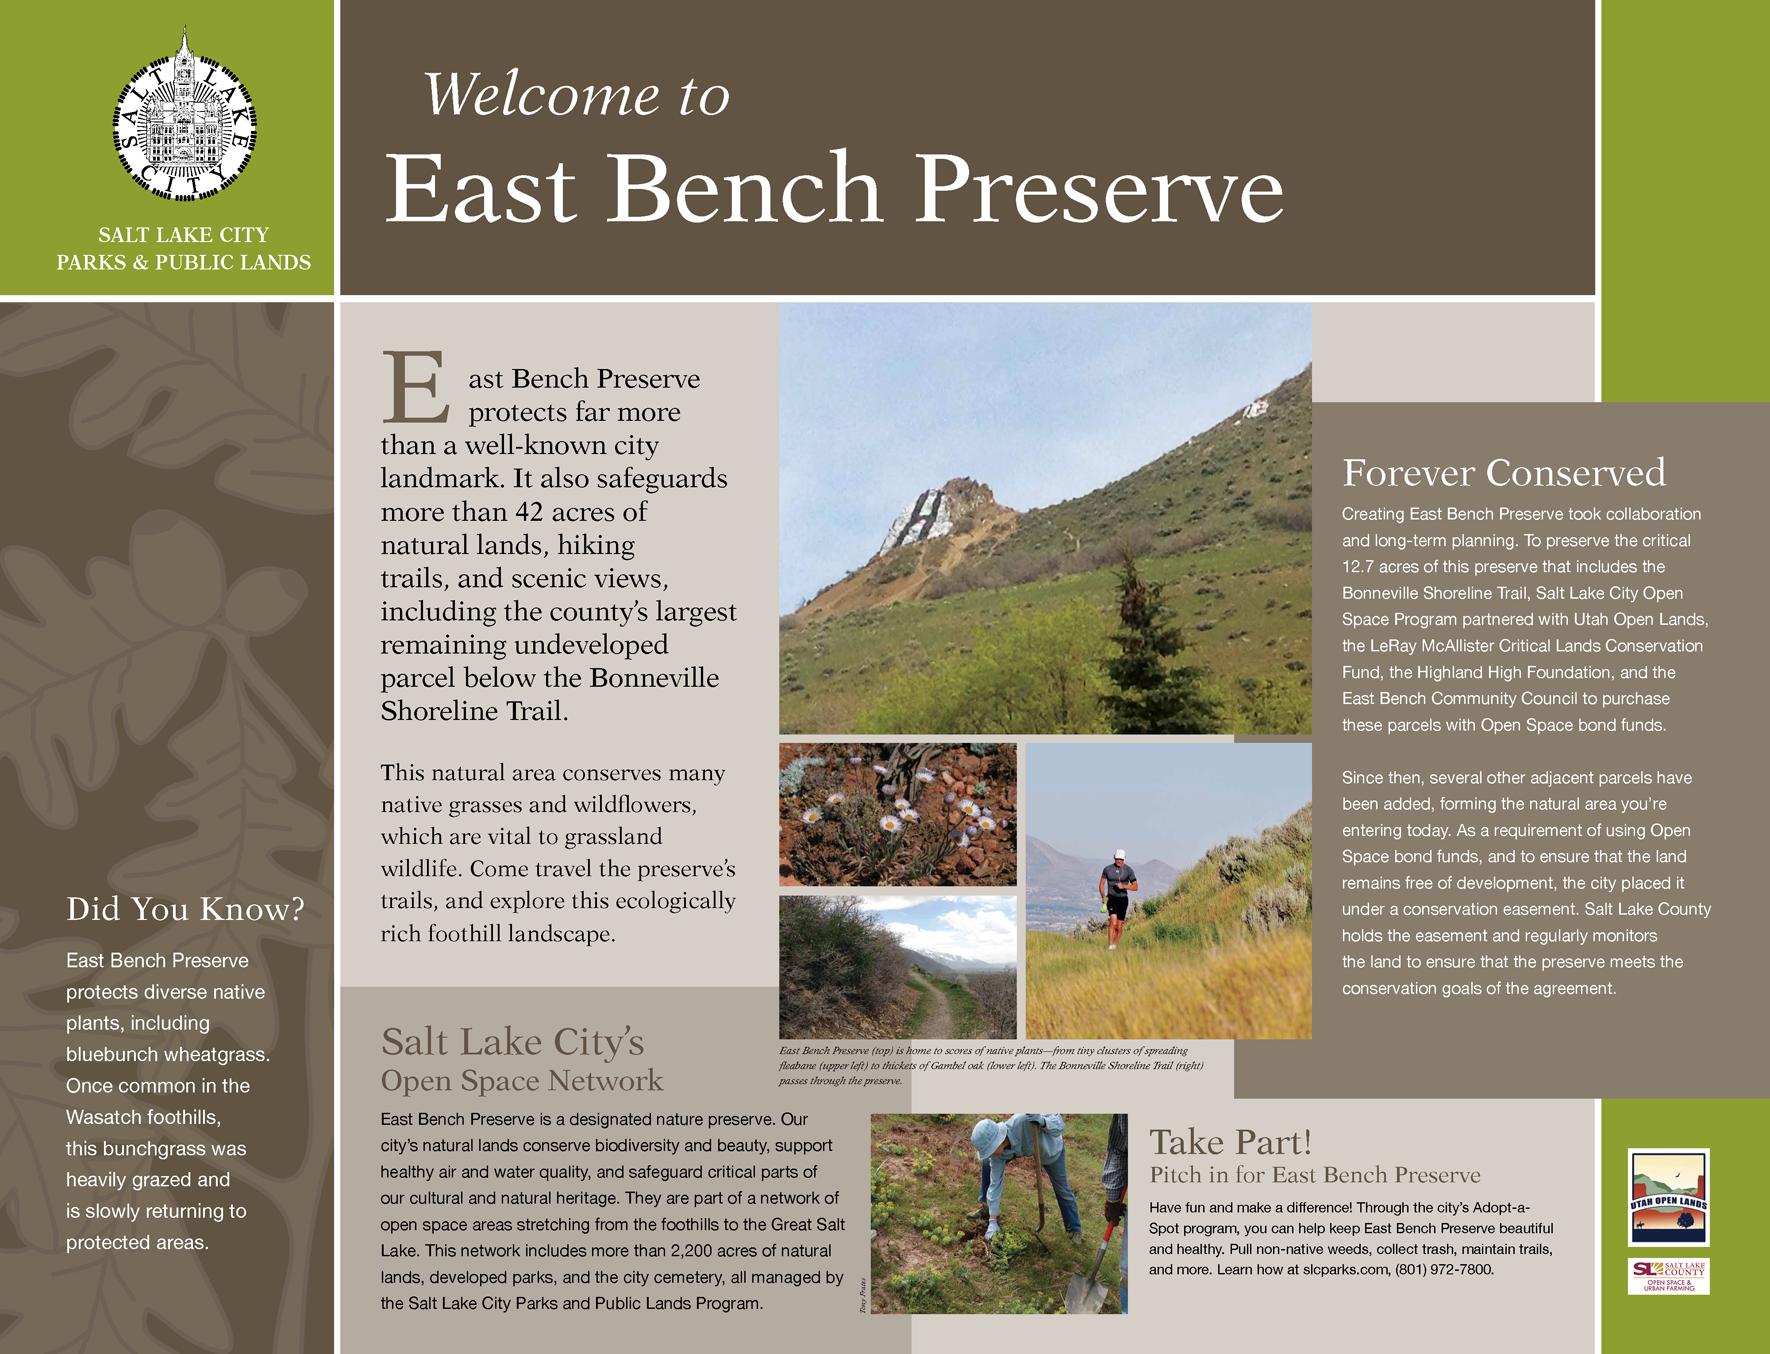 East Bench Preserve OS-Interpretive Kiosk 1-DRAFT 2-061215